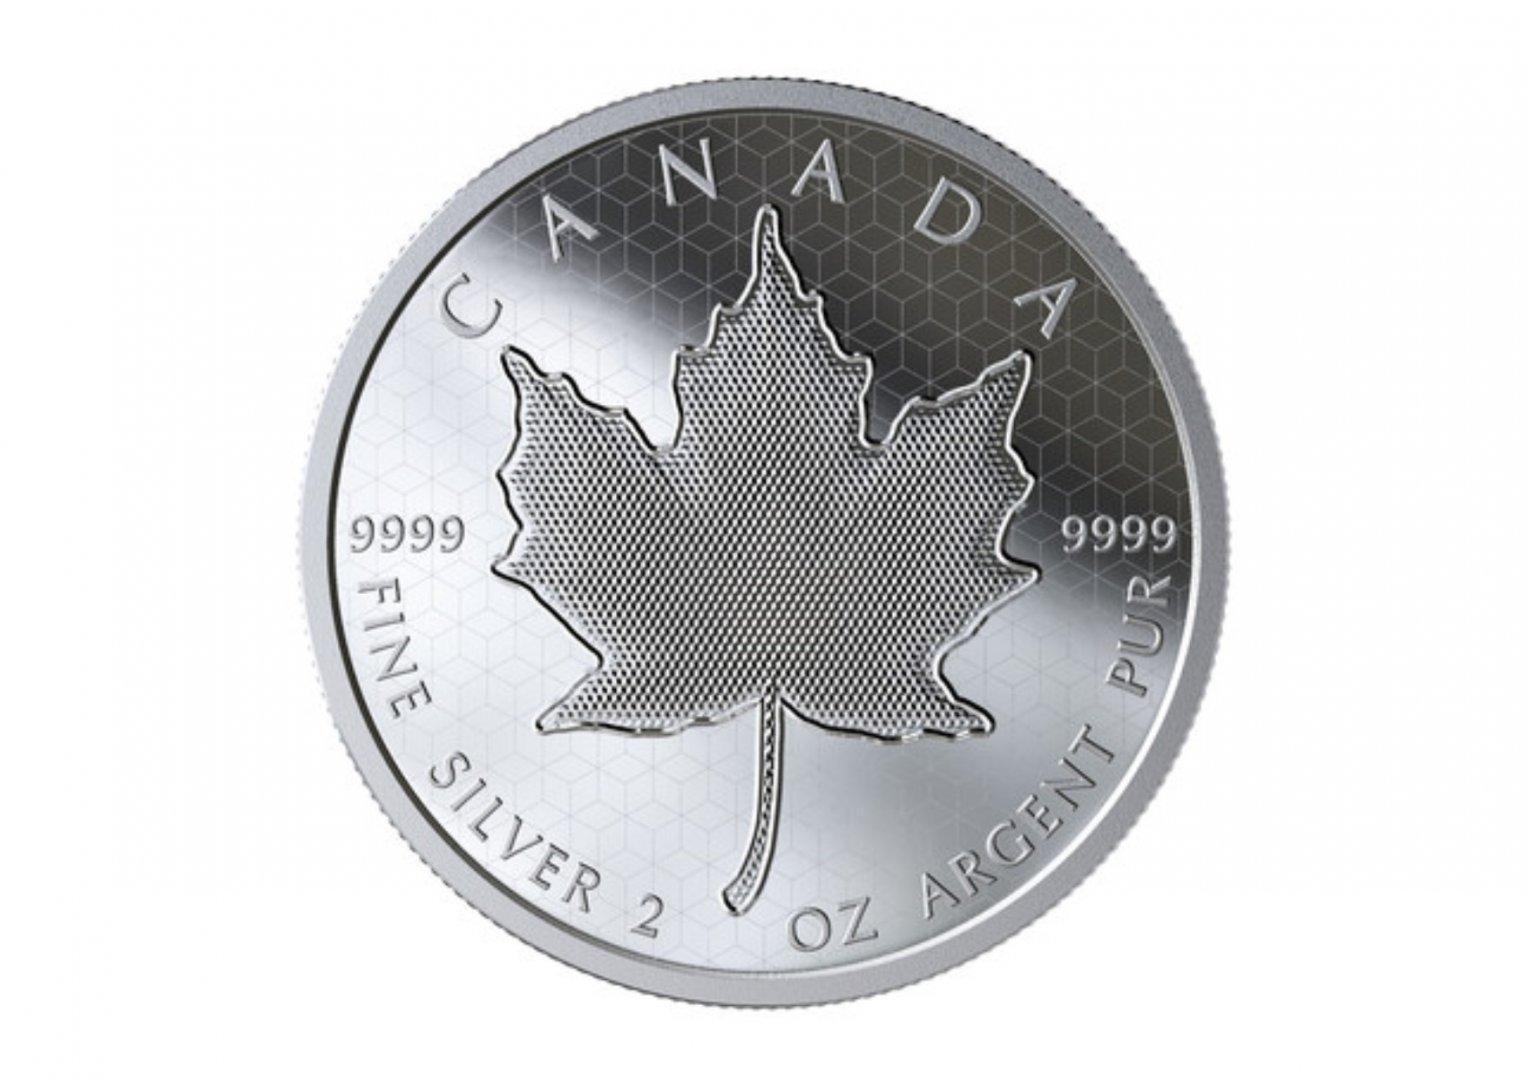 A primeira moeda de folha de bordo pulsante do mundo